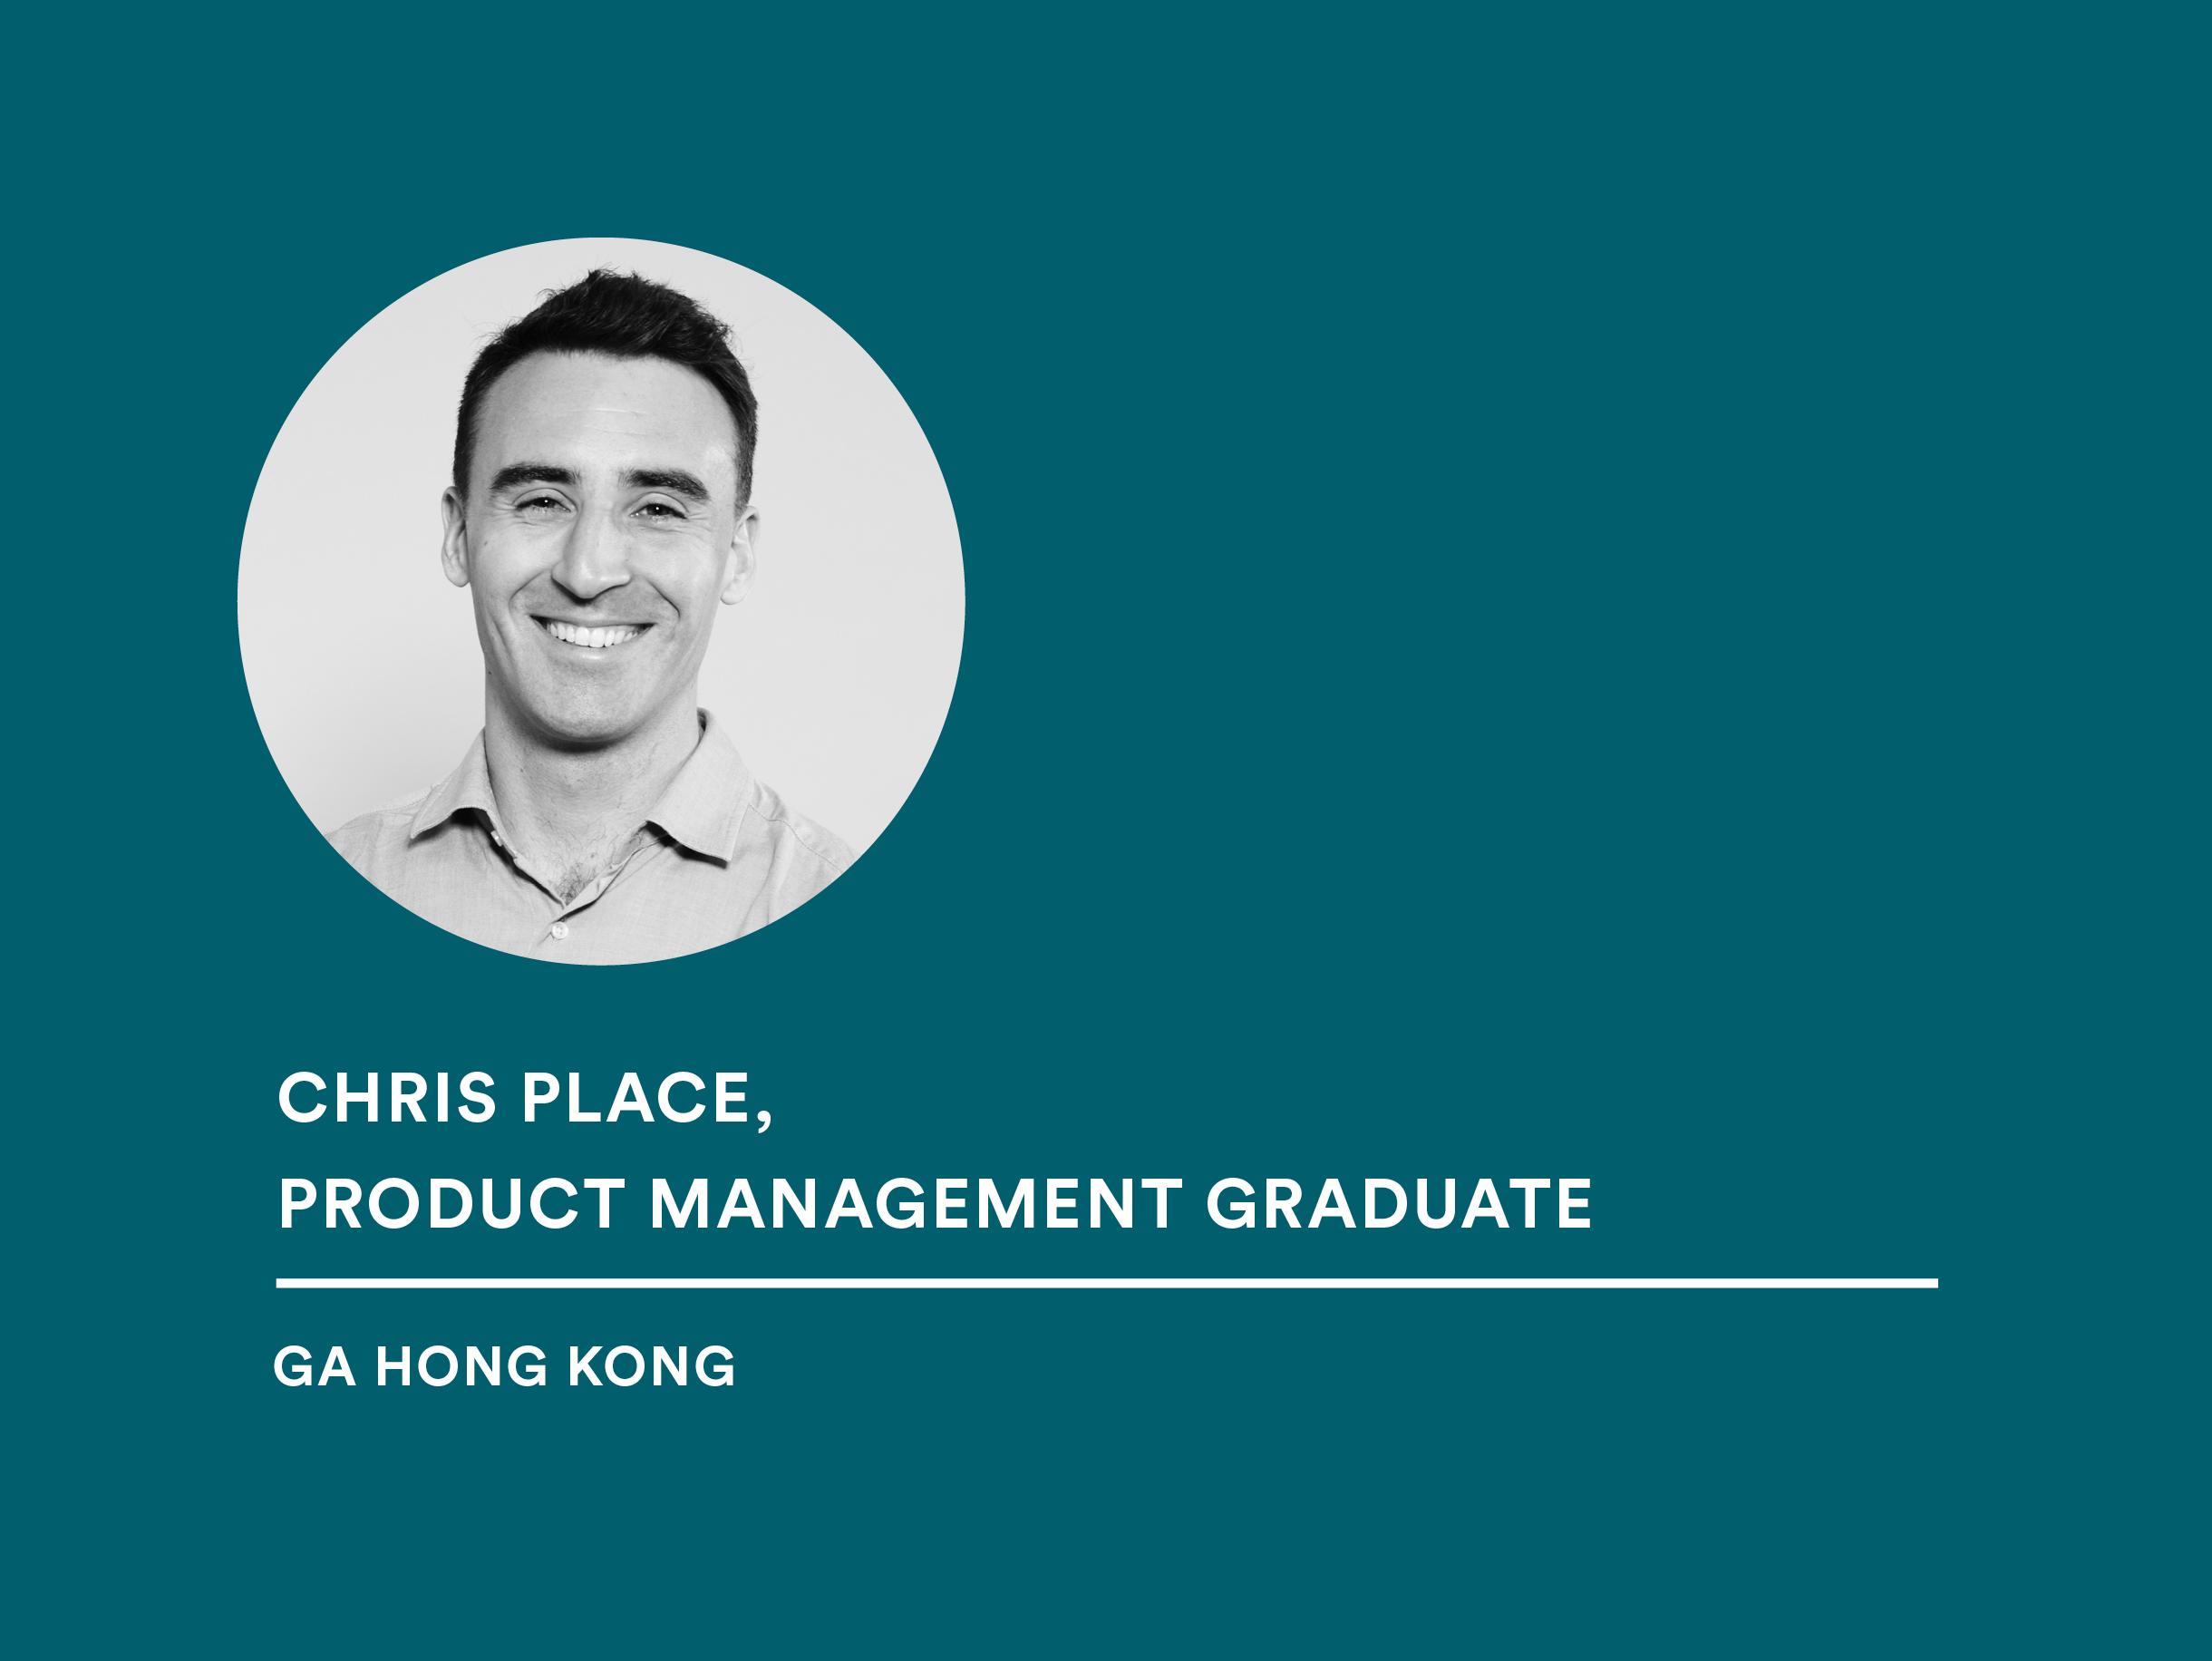 Student Chris Place